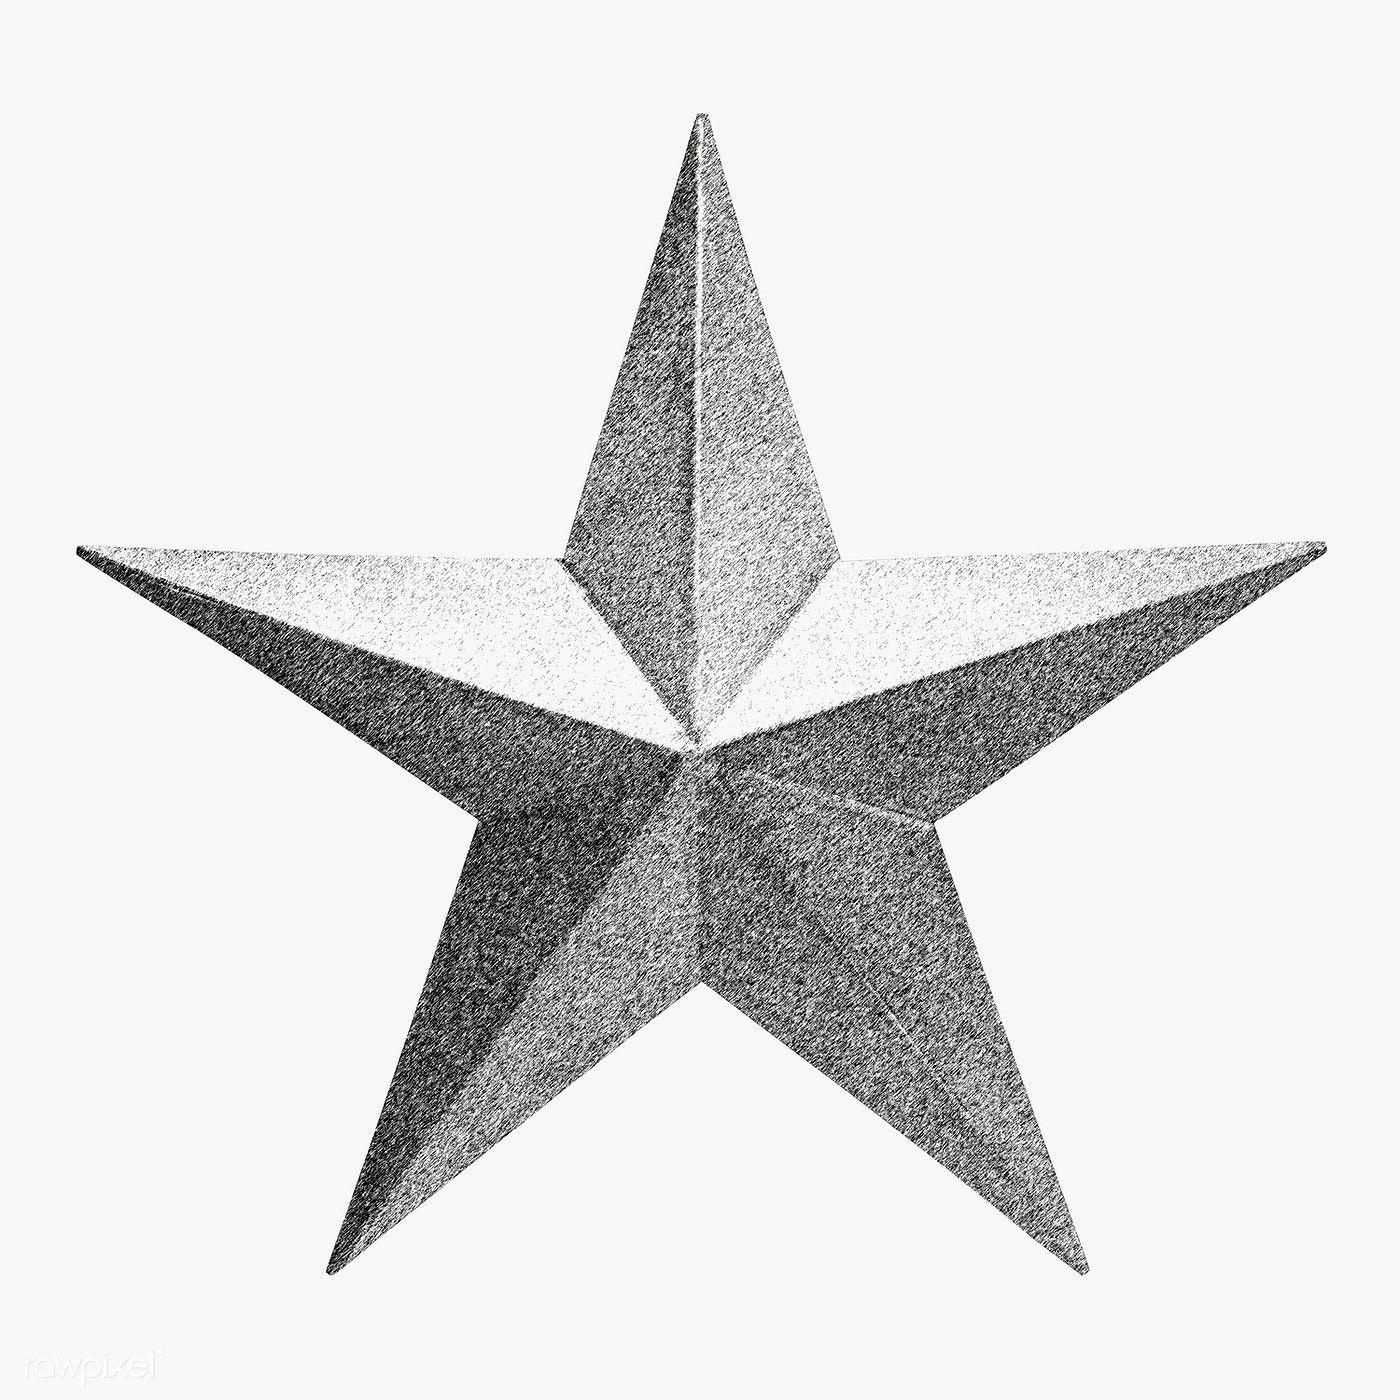 Hand Drawn Monotone Star Design Element Free Image By Rawpixel Com Winn Star Designs Design Element How To Draw Hands